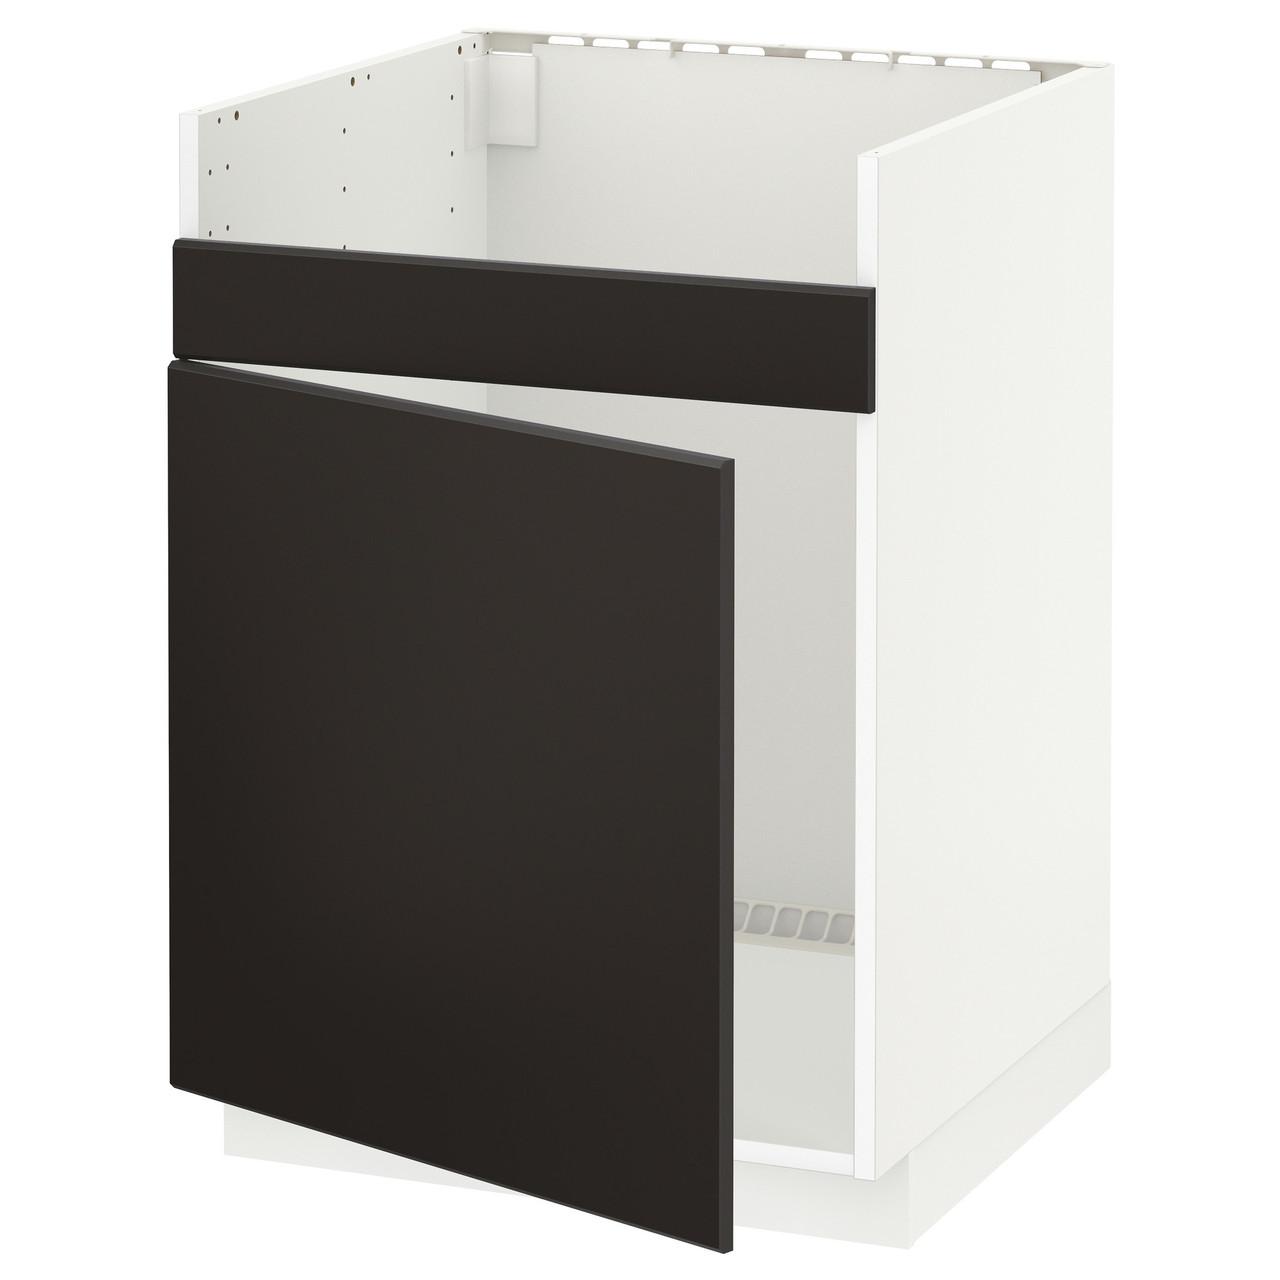 Тумба под раковину IKEA METOD HAVSEN 60x60 см Kungsbacka антрацит белая 592.802.68